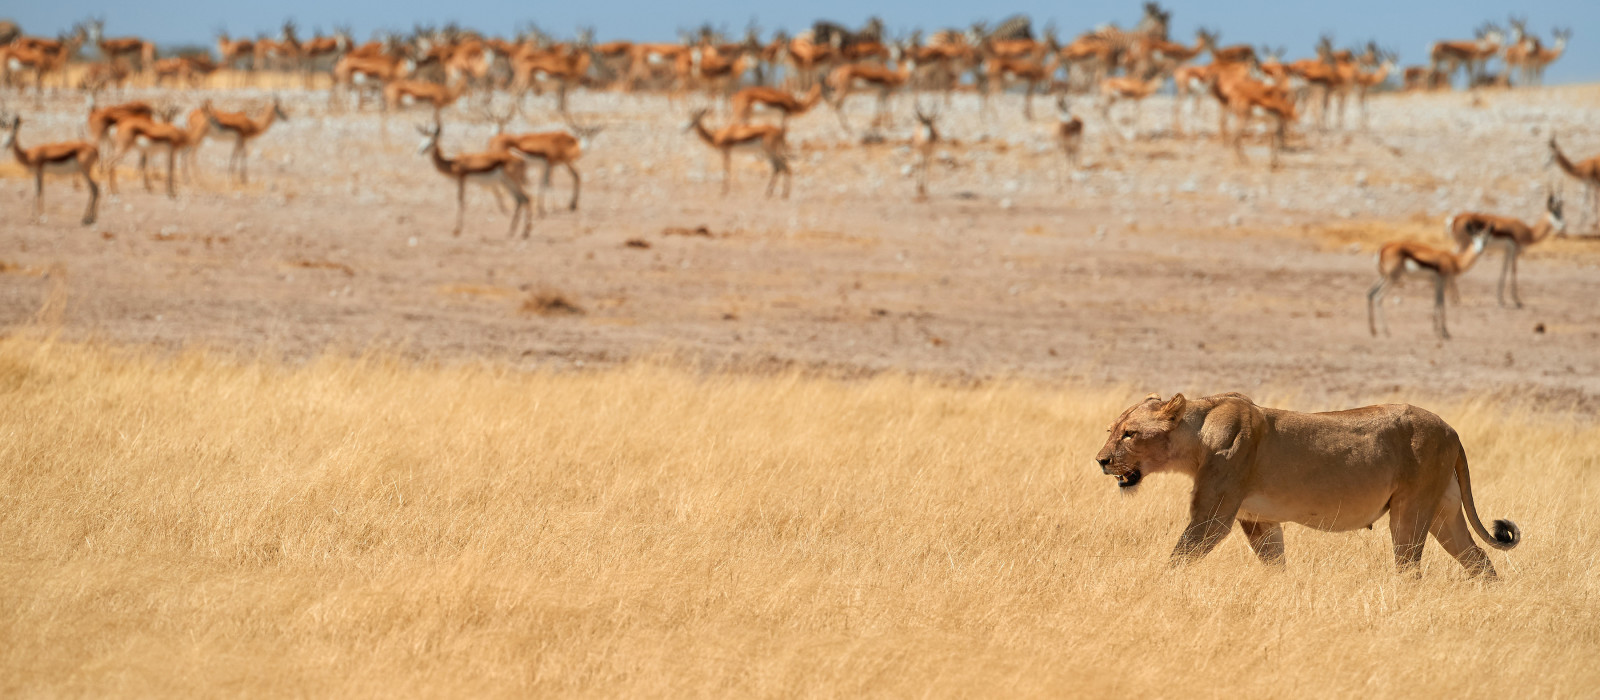 Lioness, Panthera leo, walking in dry savanna against herds of springbok antelopes of Etosha national park, Namibia, Africa